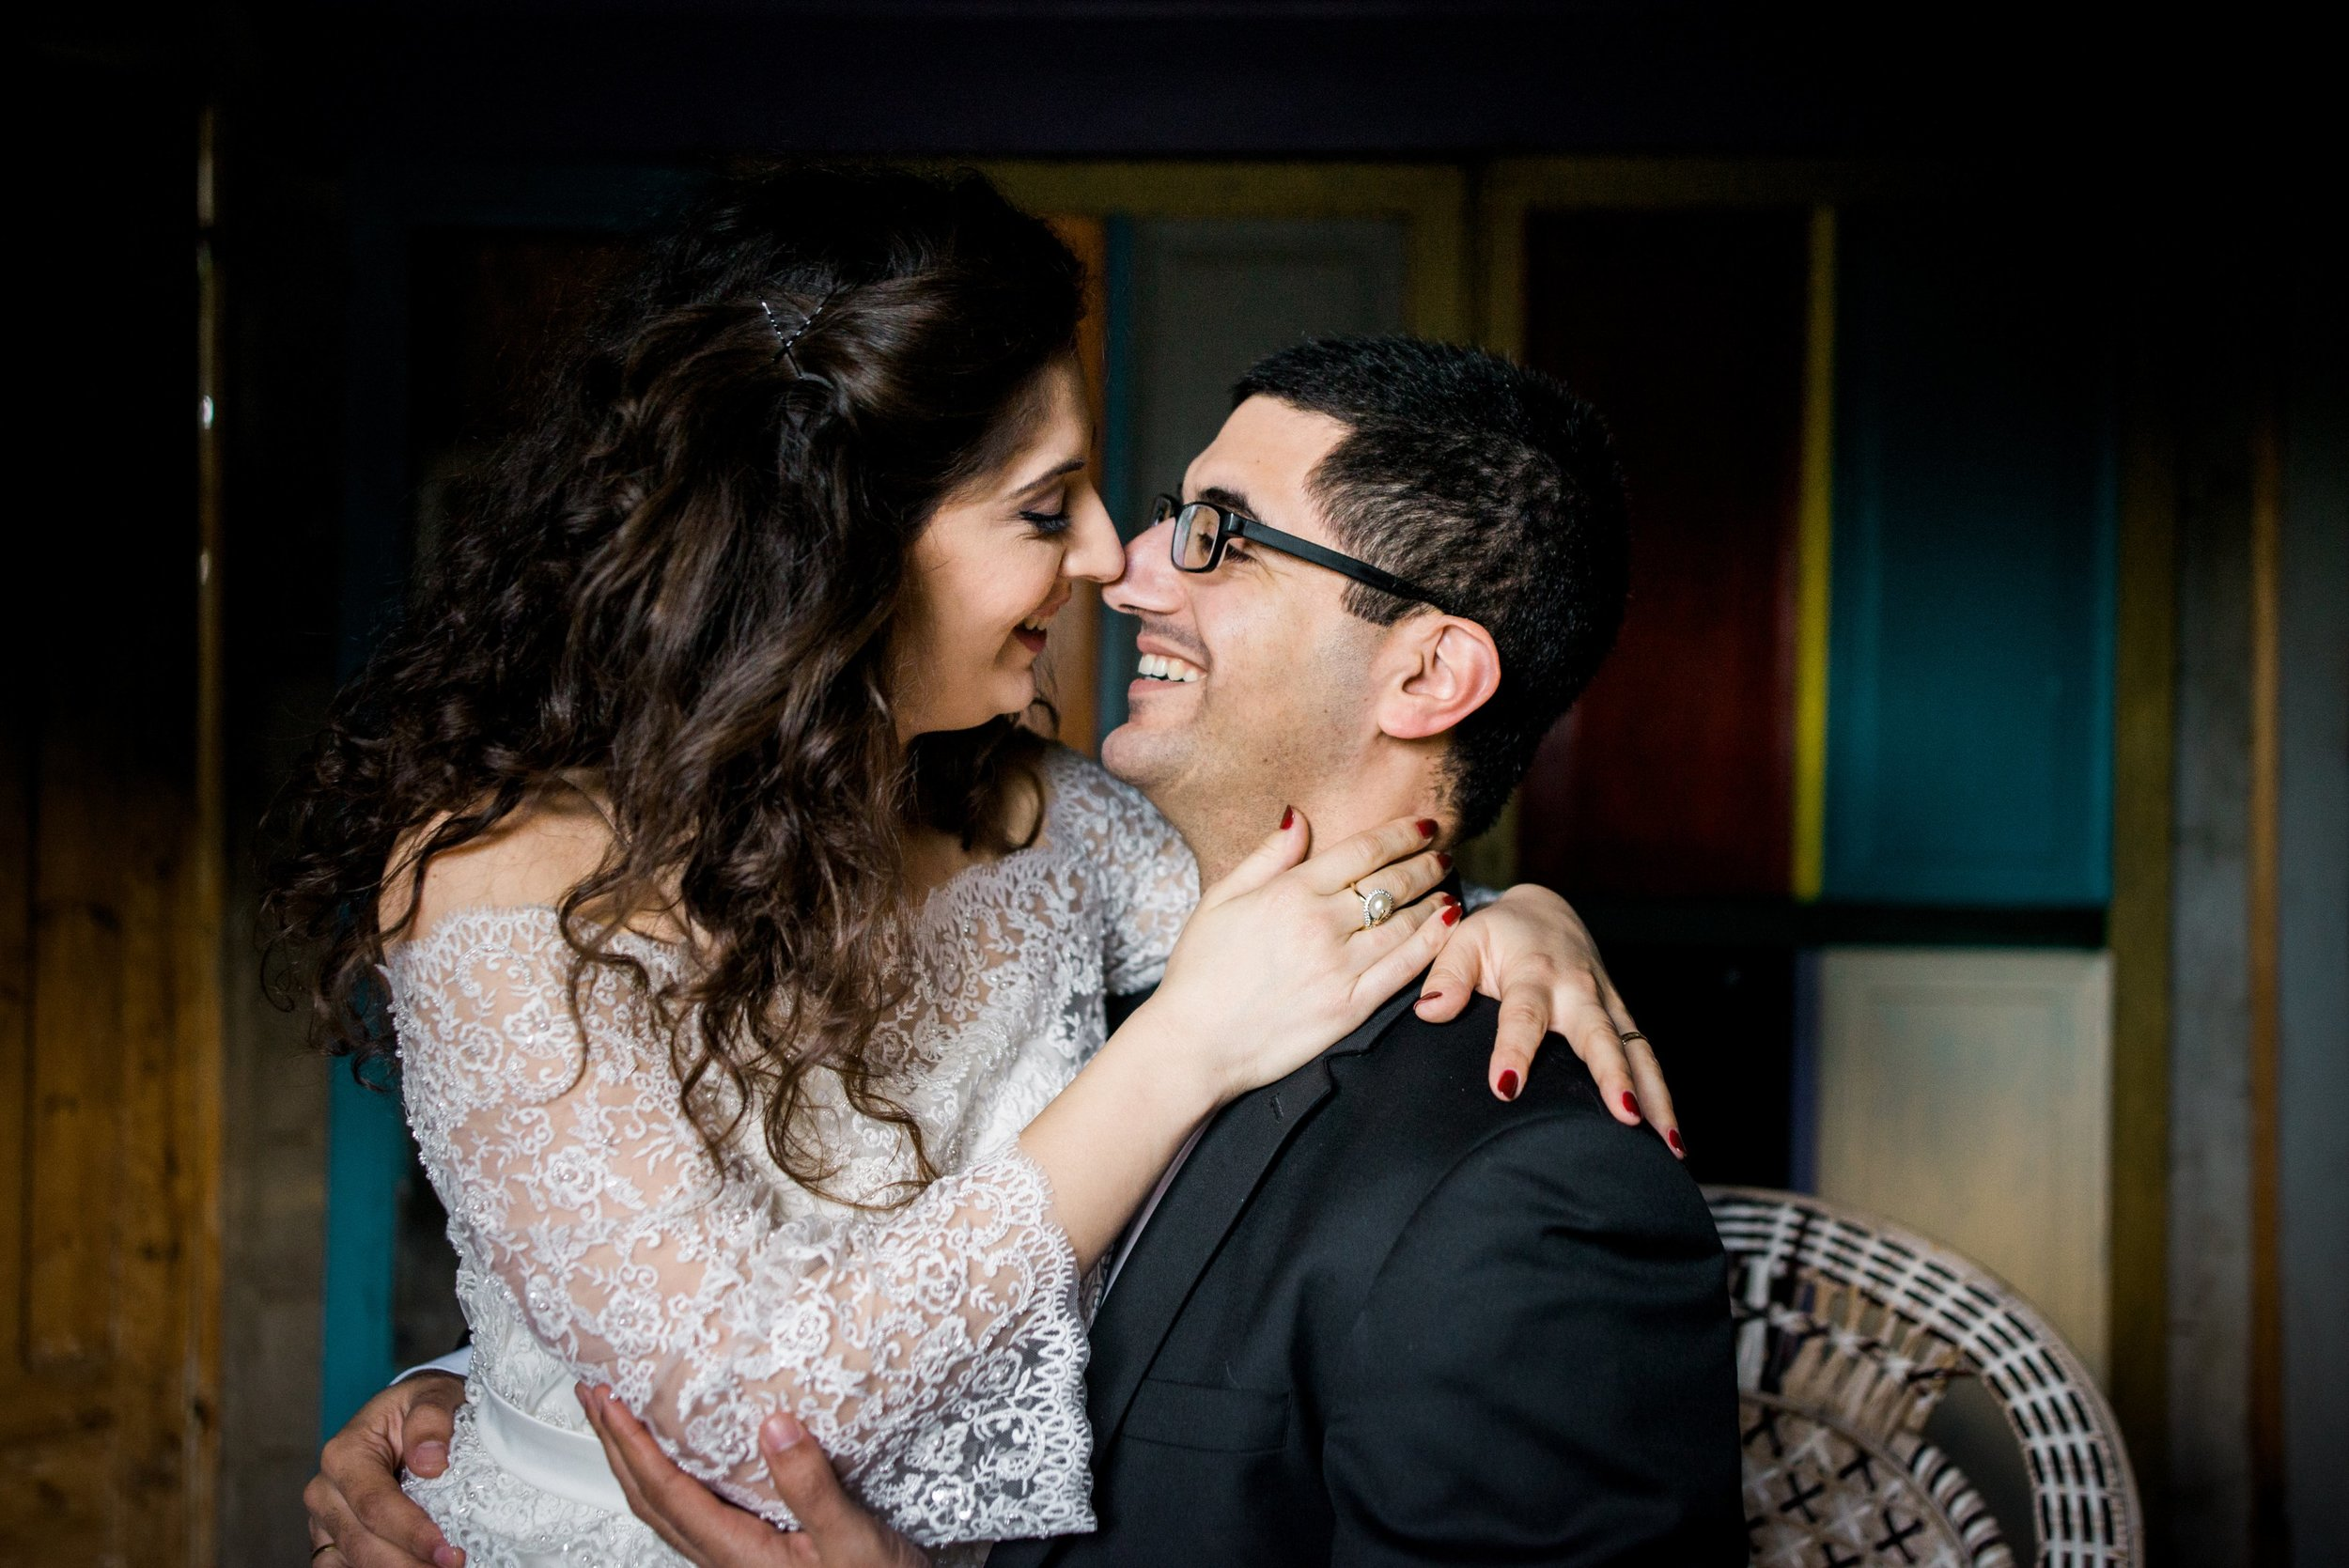 israel-garden-wedding-portraits-session-kate-giryes-photography--52_WEB.jpg